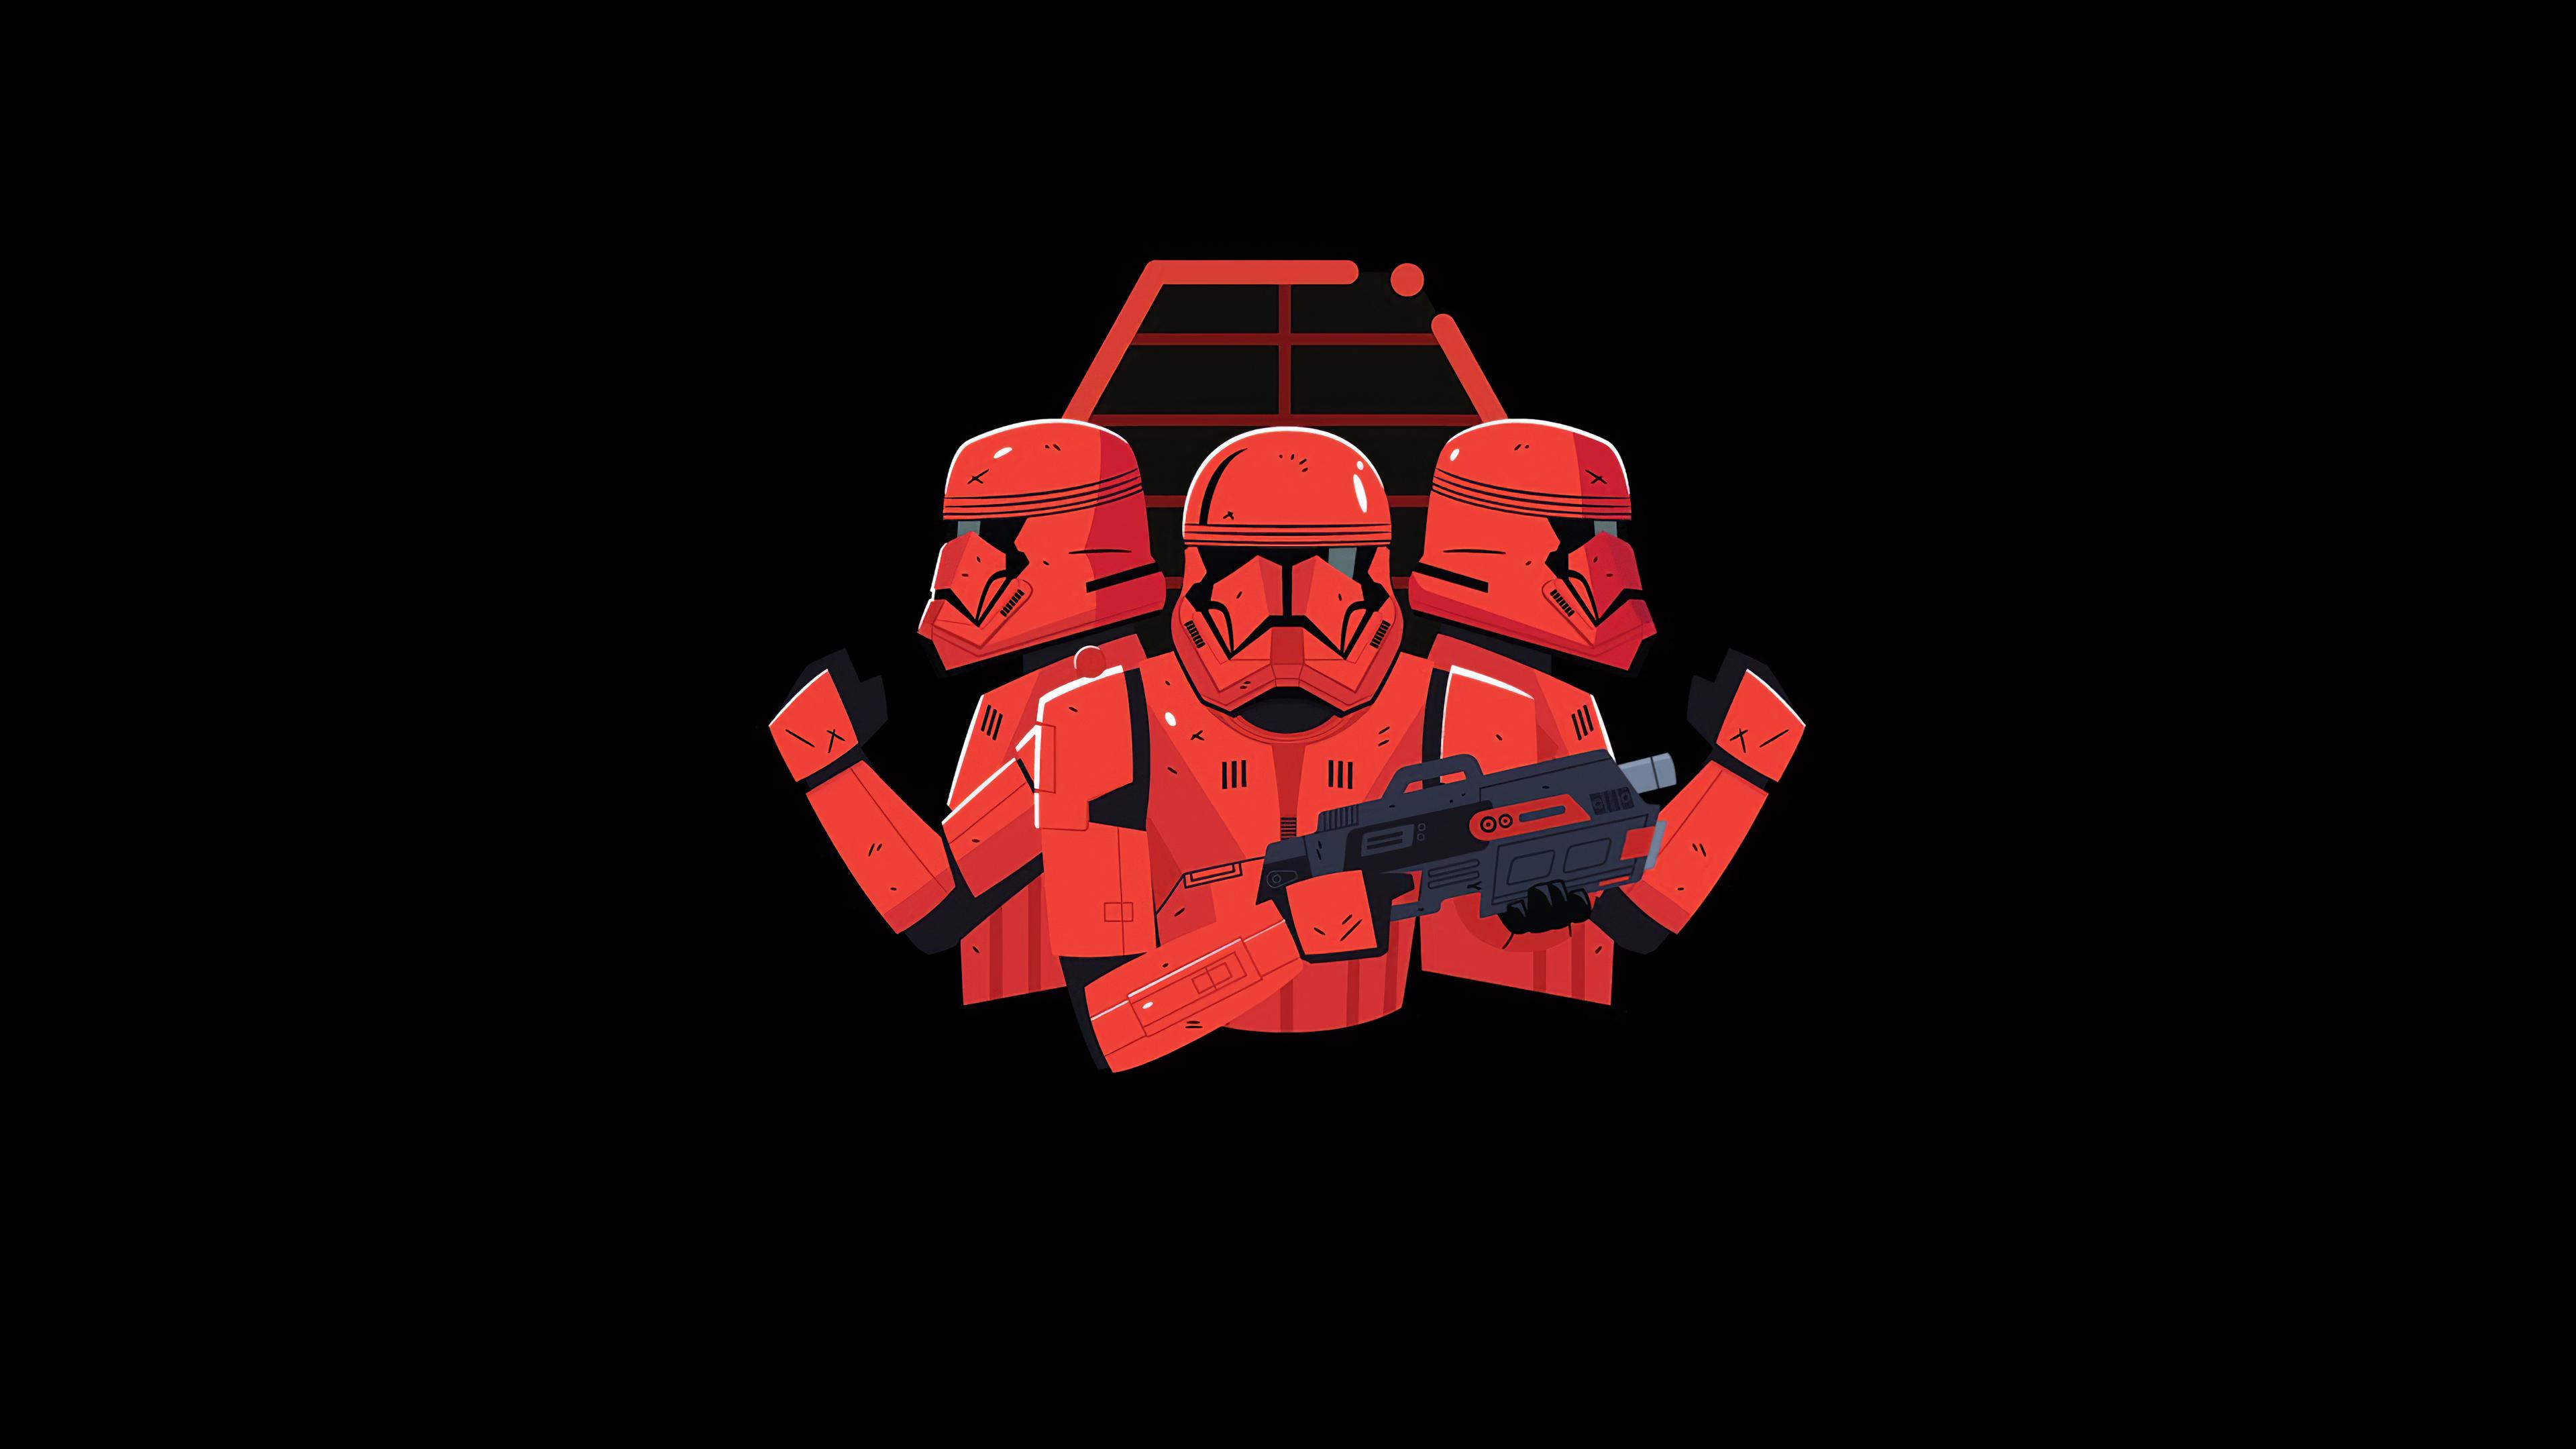 Wallpaper 4k Star Wars Stormtrooper Minimal